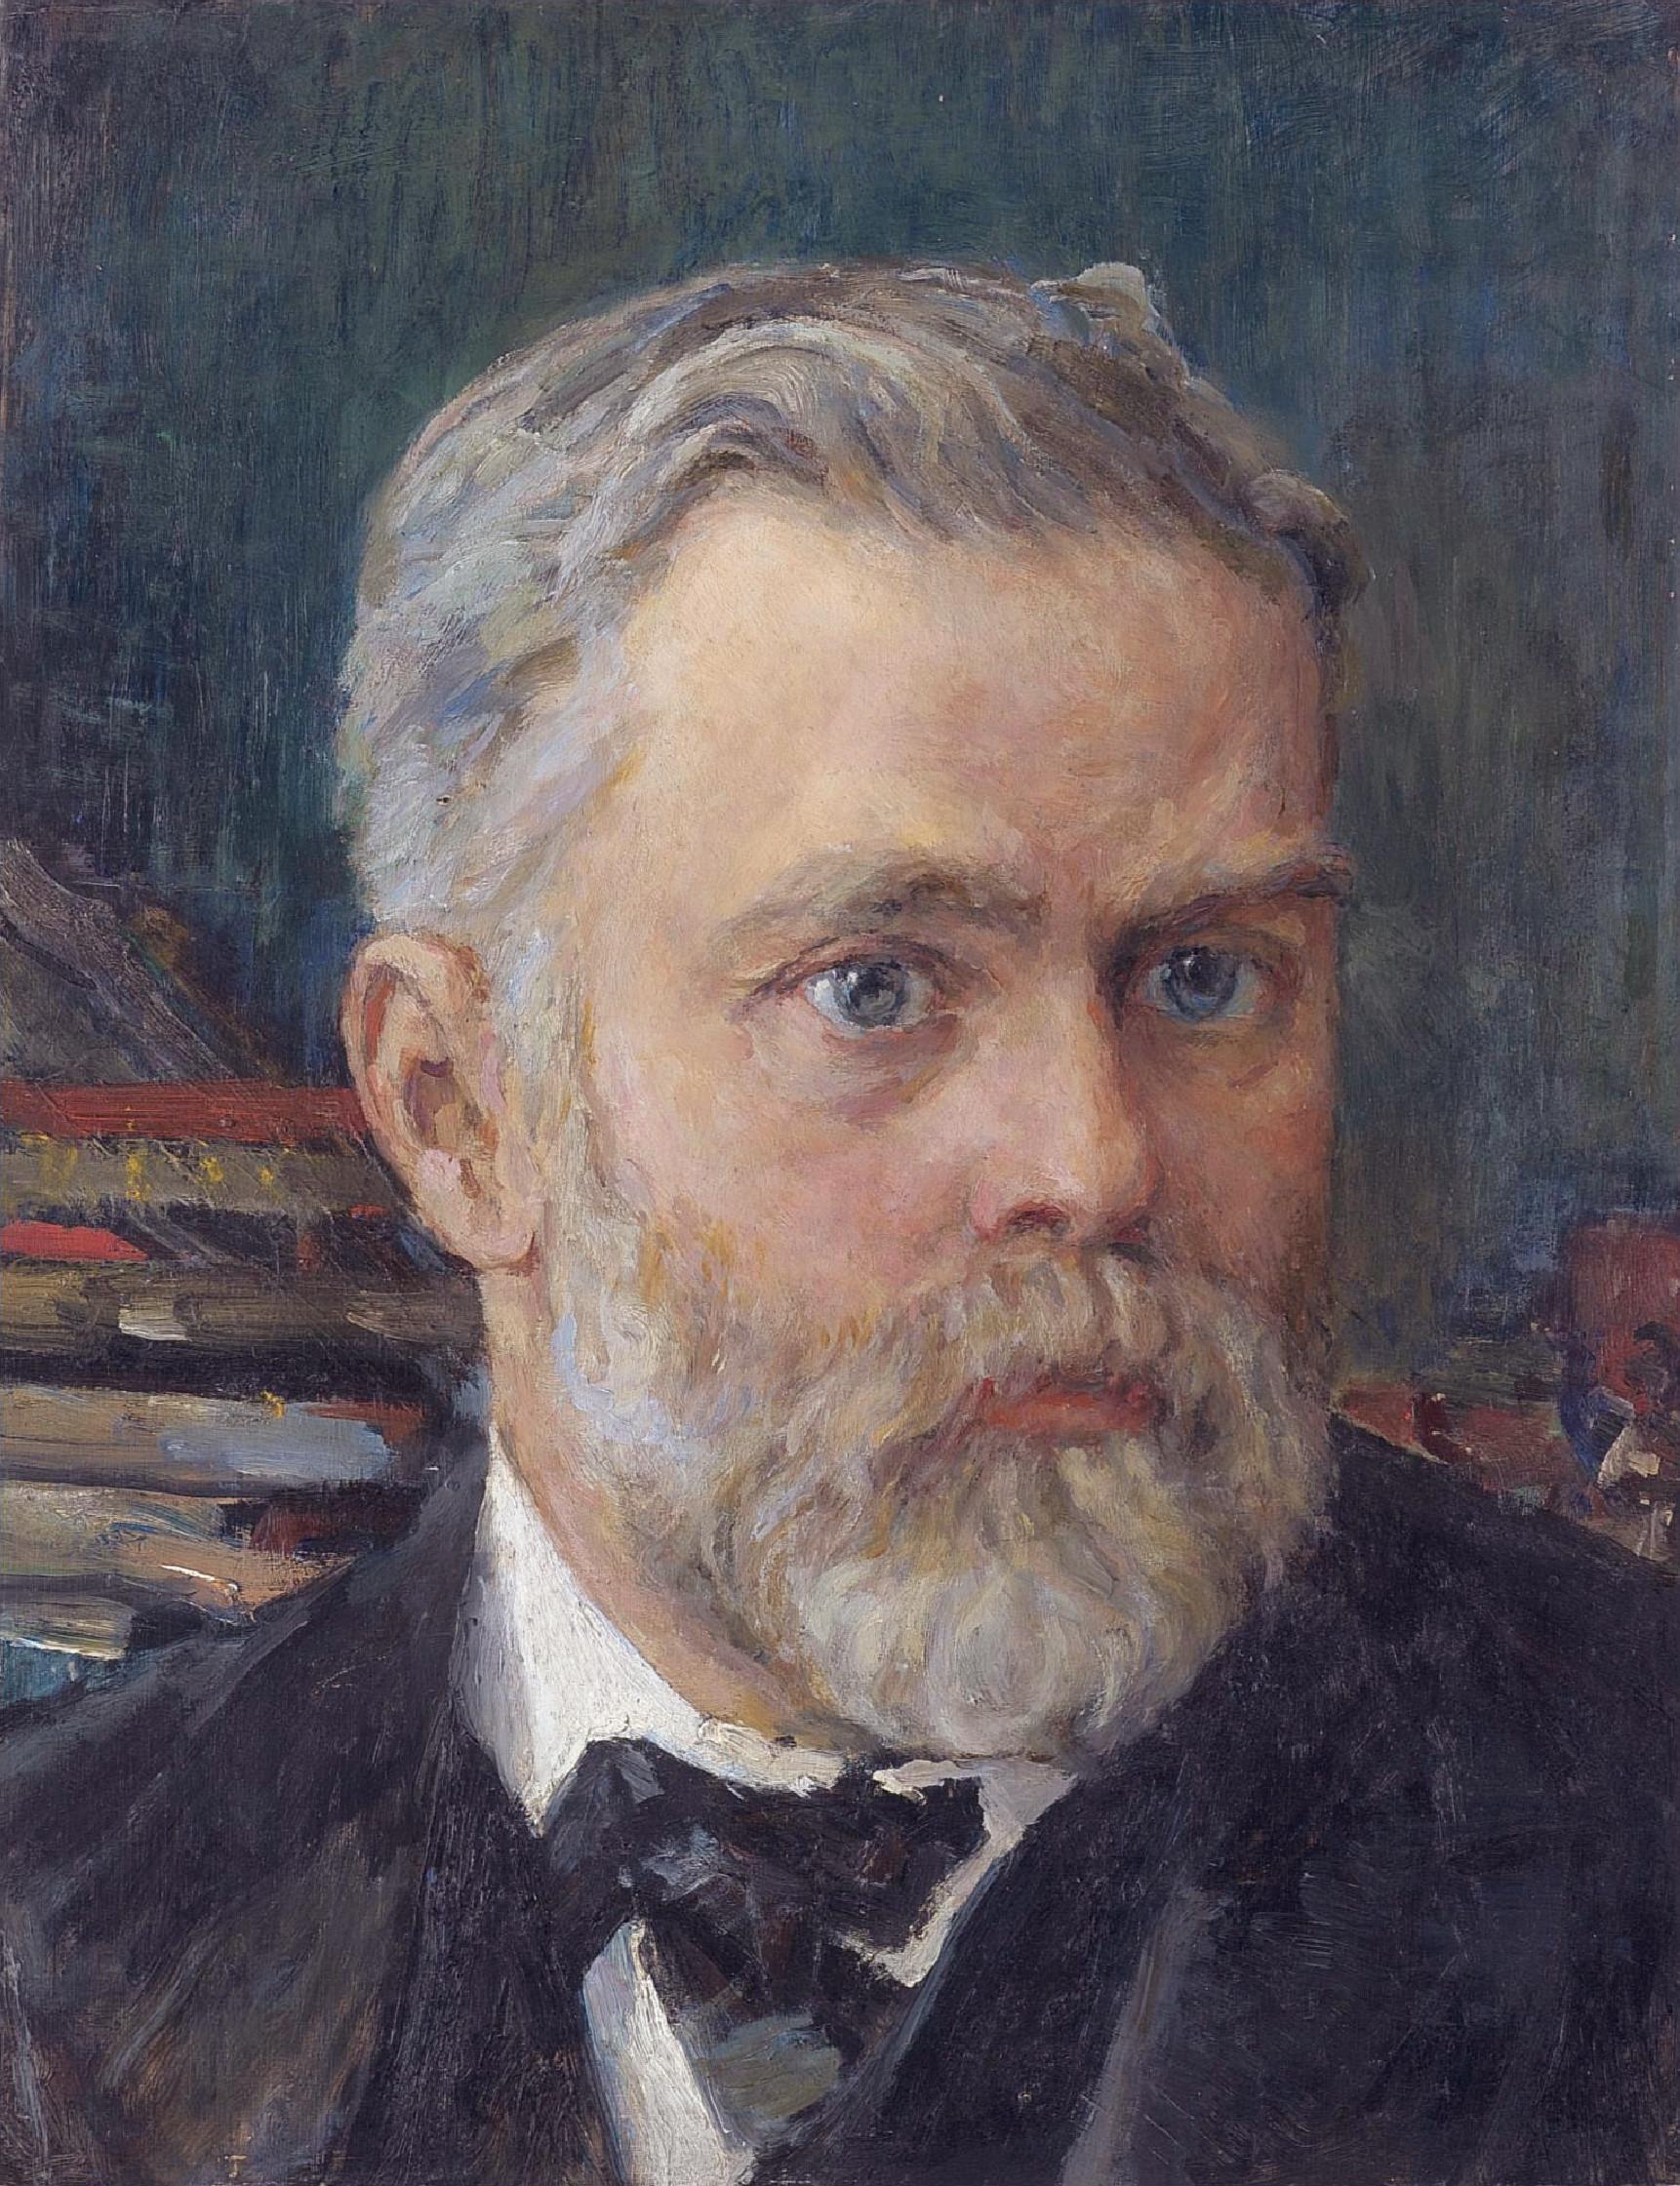 Emanuel Nobel, portrait by famous Russian artist Valentin Serov